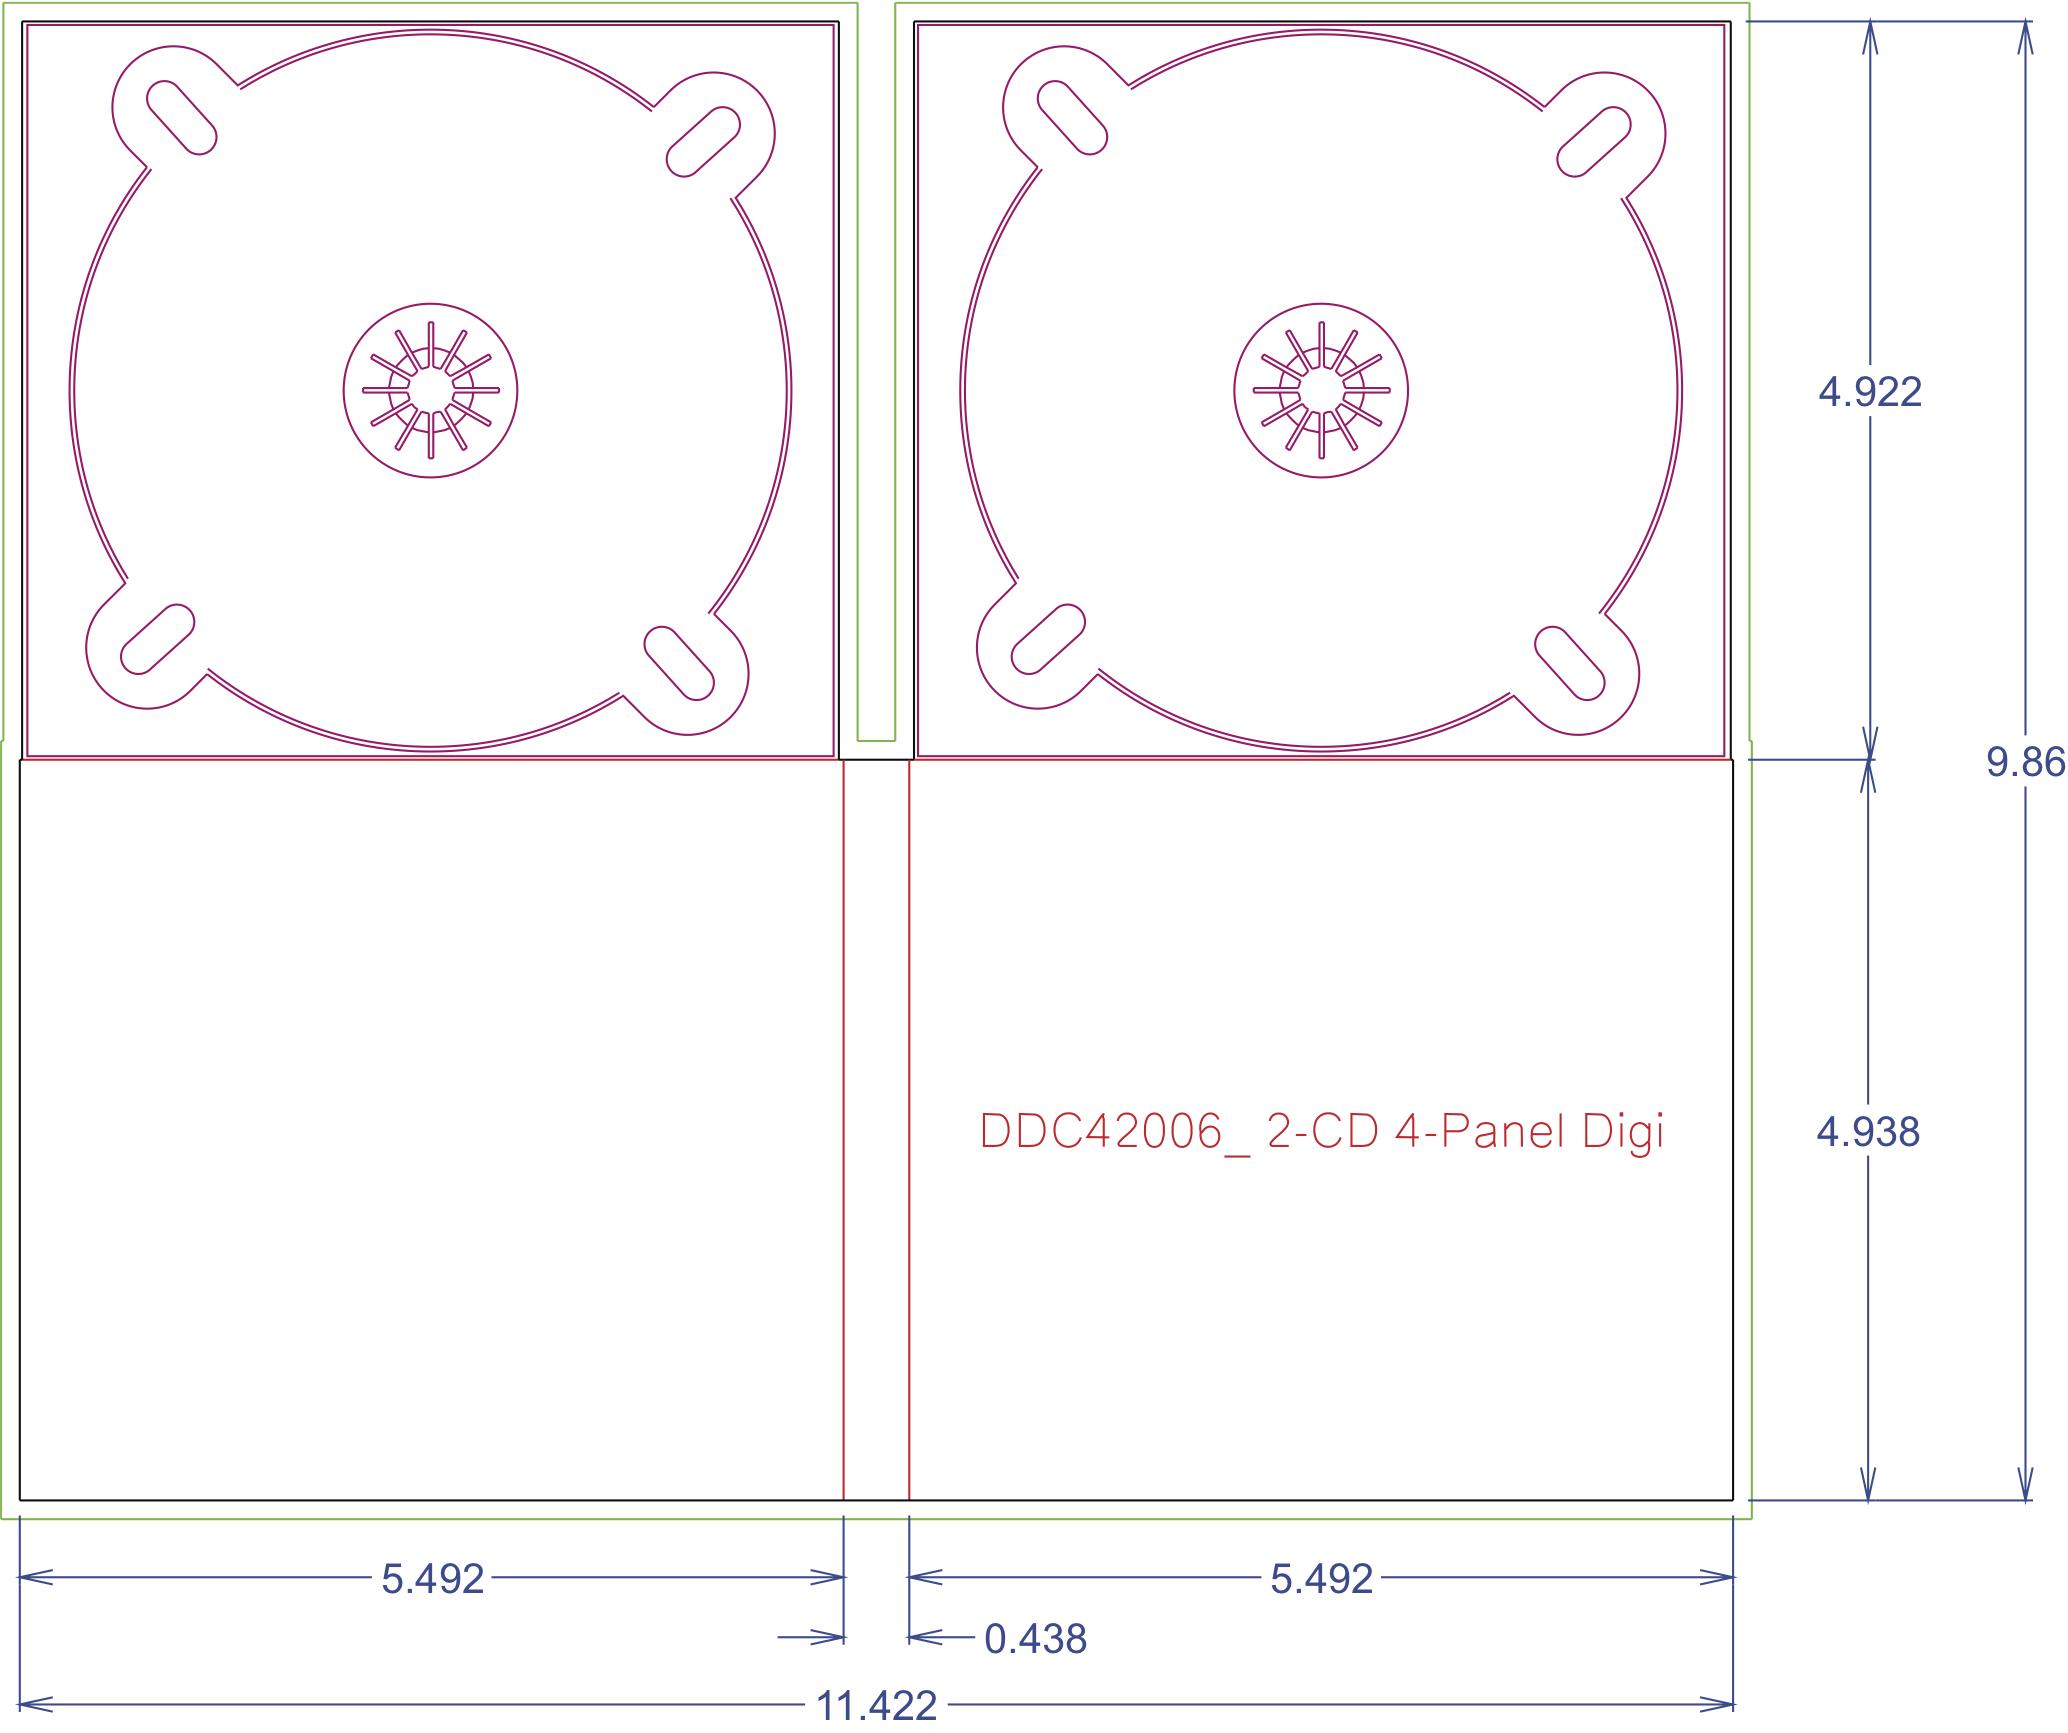 DDC42006 - 4 Panel Digi 2 CD